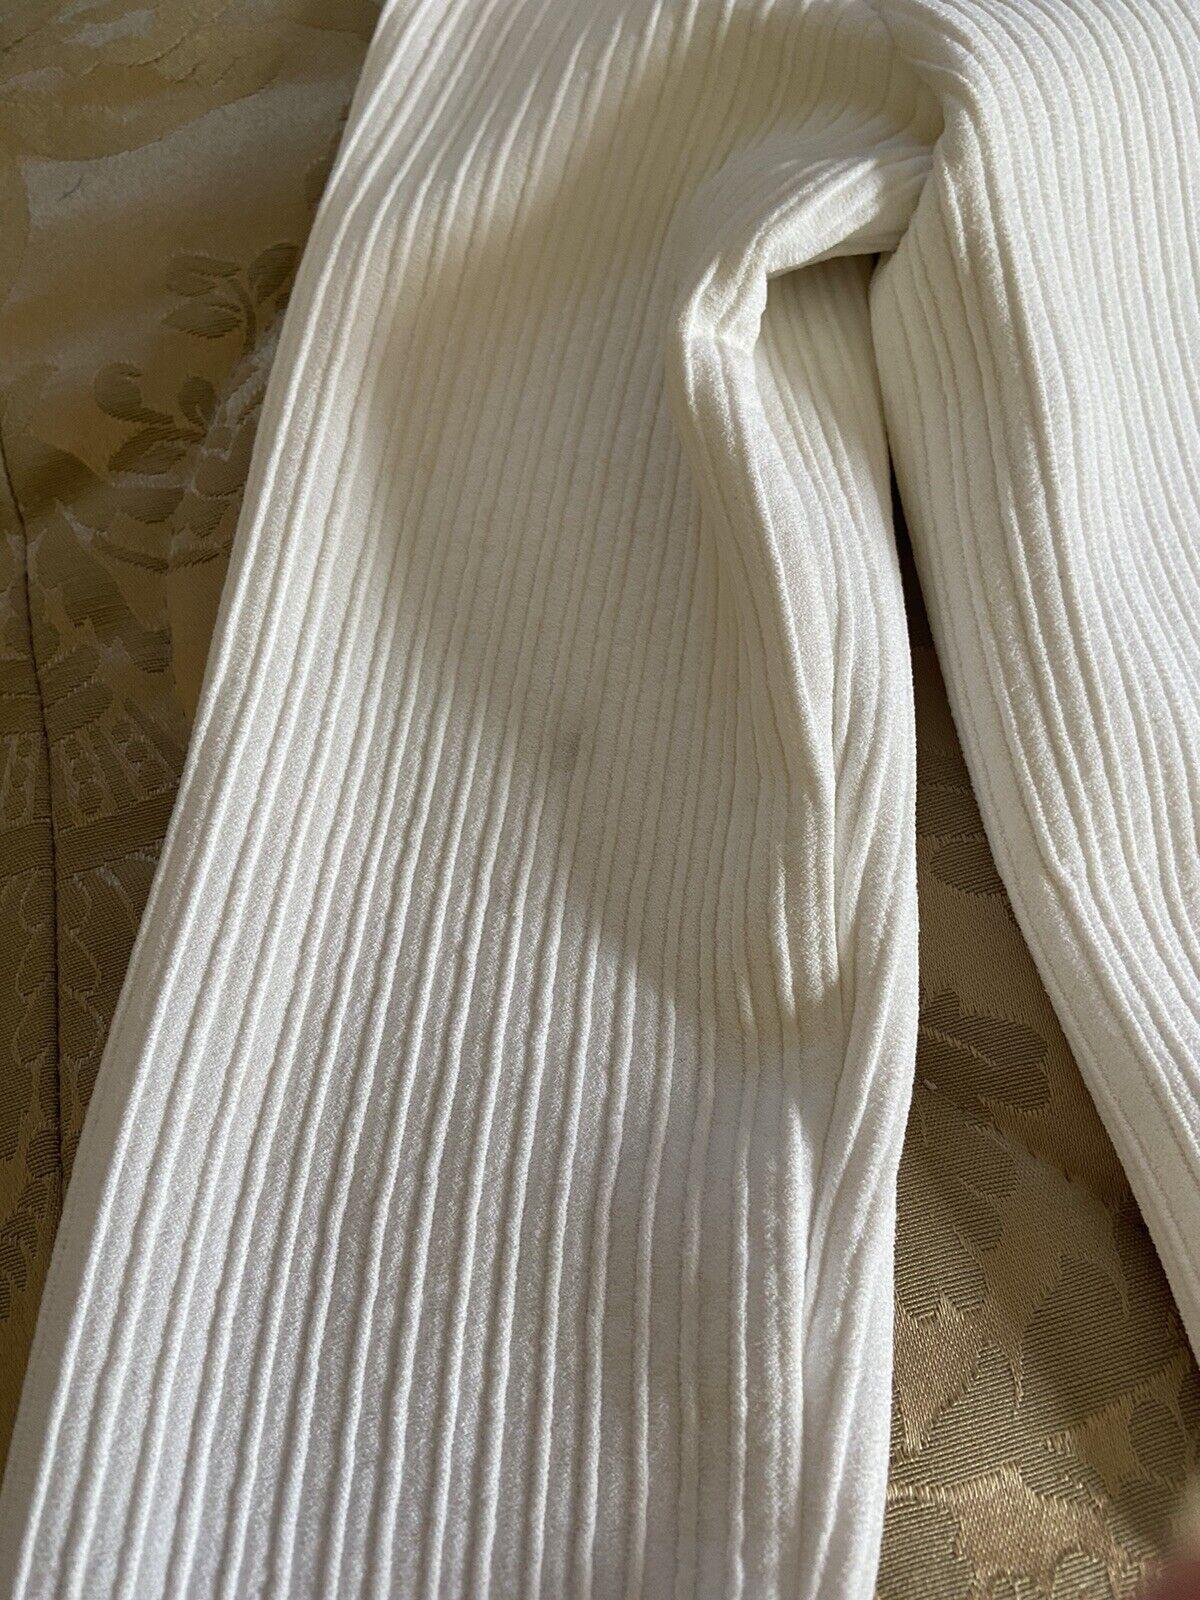 Azzedine Alaia White Long Sleeve Top Blouse Dress… - image 10